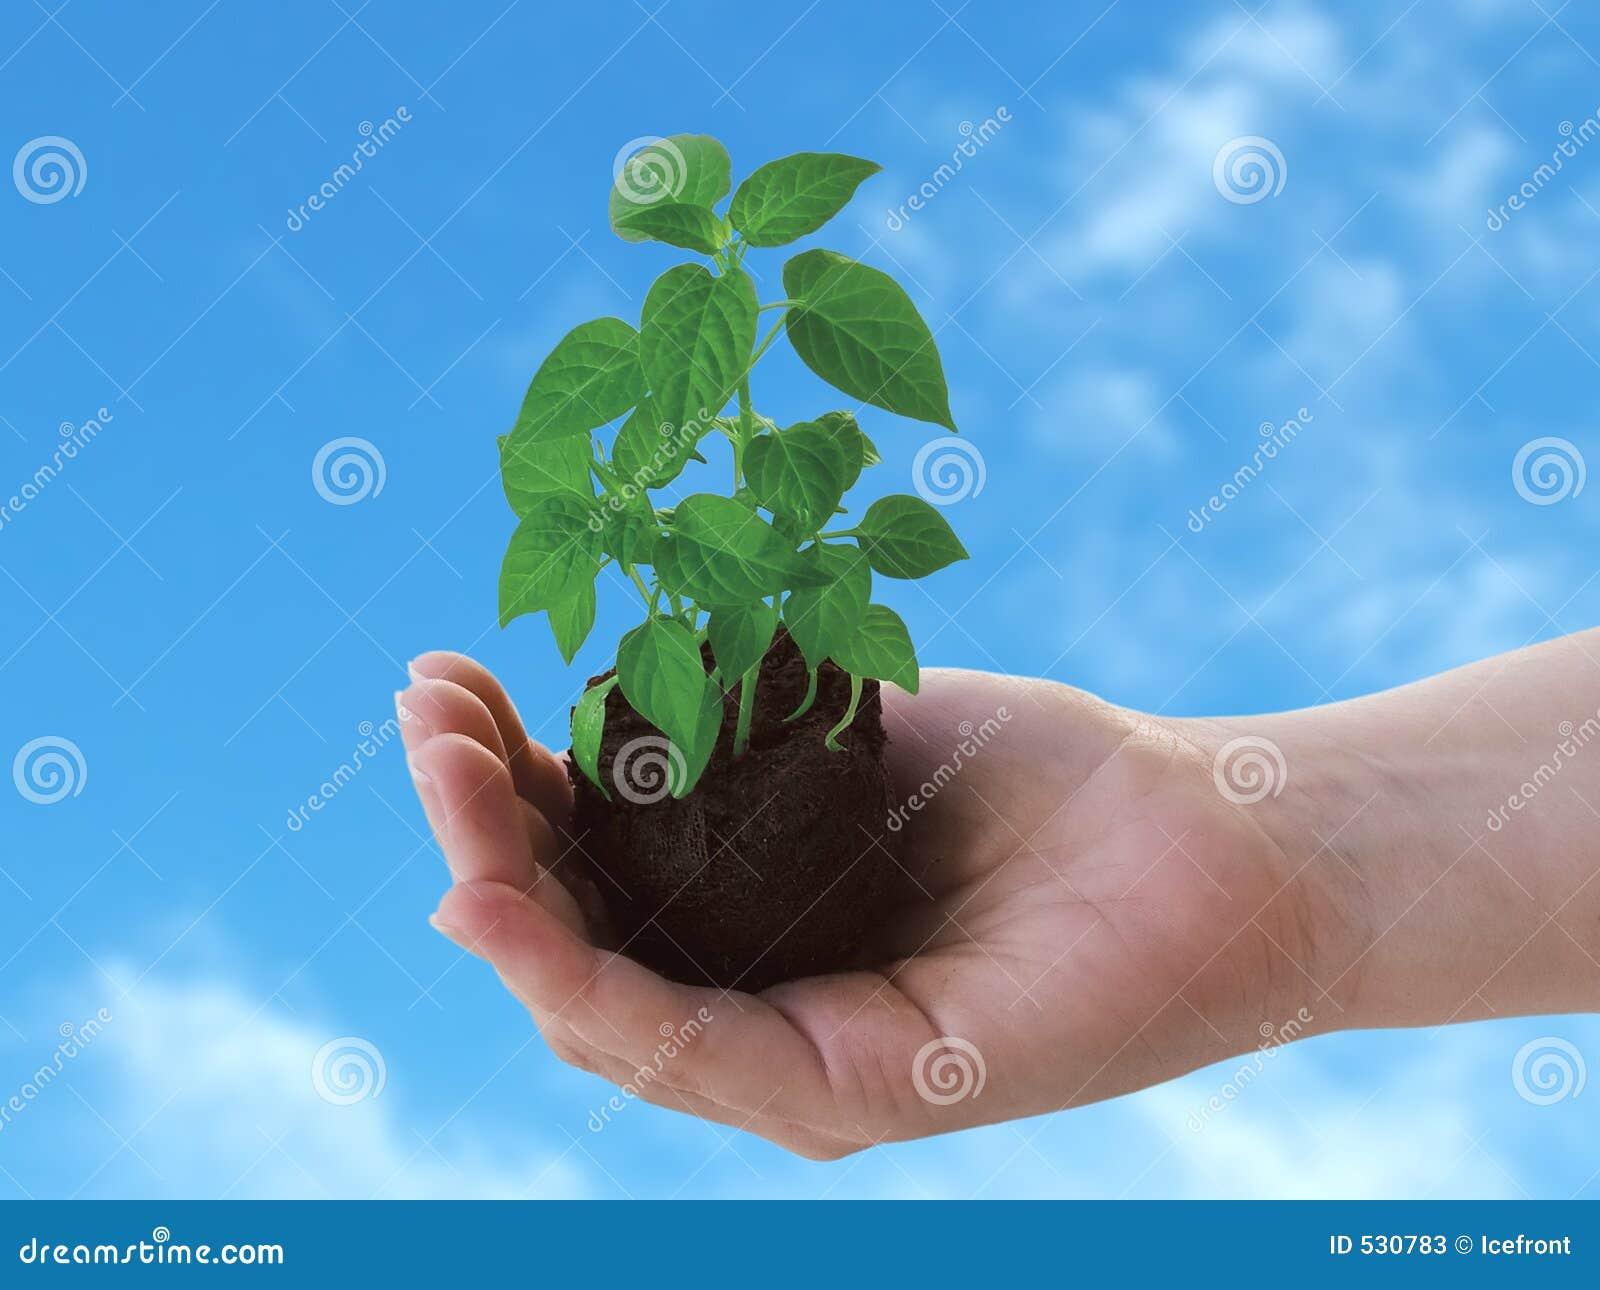 Download 现有量工厂 库存图片. 图片 包括有 叶子, 奶妈养育的婴幼儿, 不尽, 庭院, 概念, 绿色, 居住, 手指 - 530783